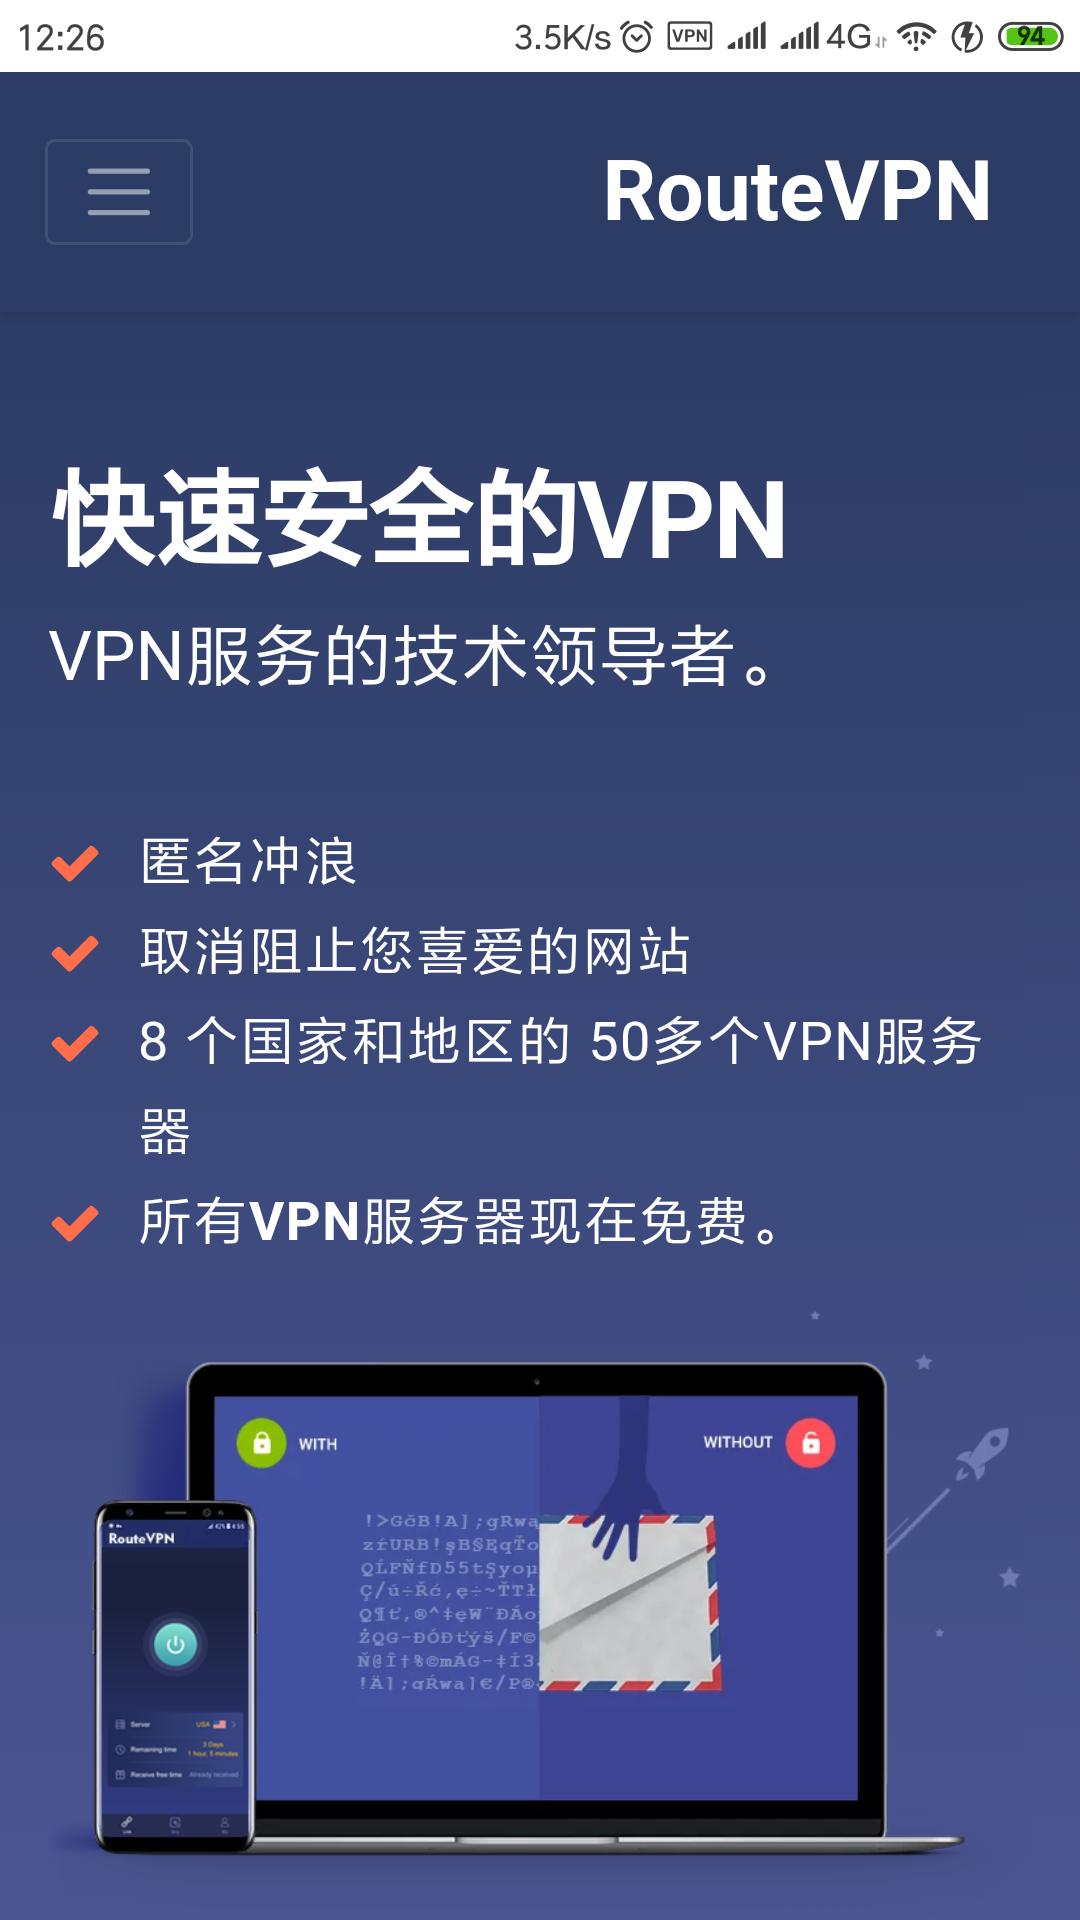 routevpn:免费极速无广告还搭建啥服务器呢(windows/苹果ios/android)